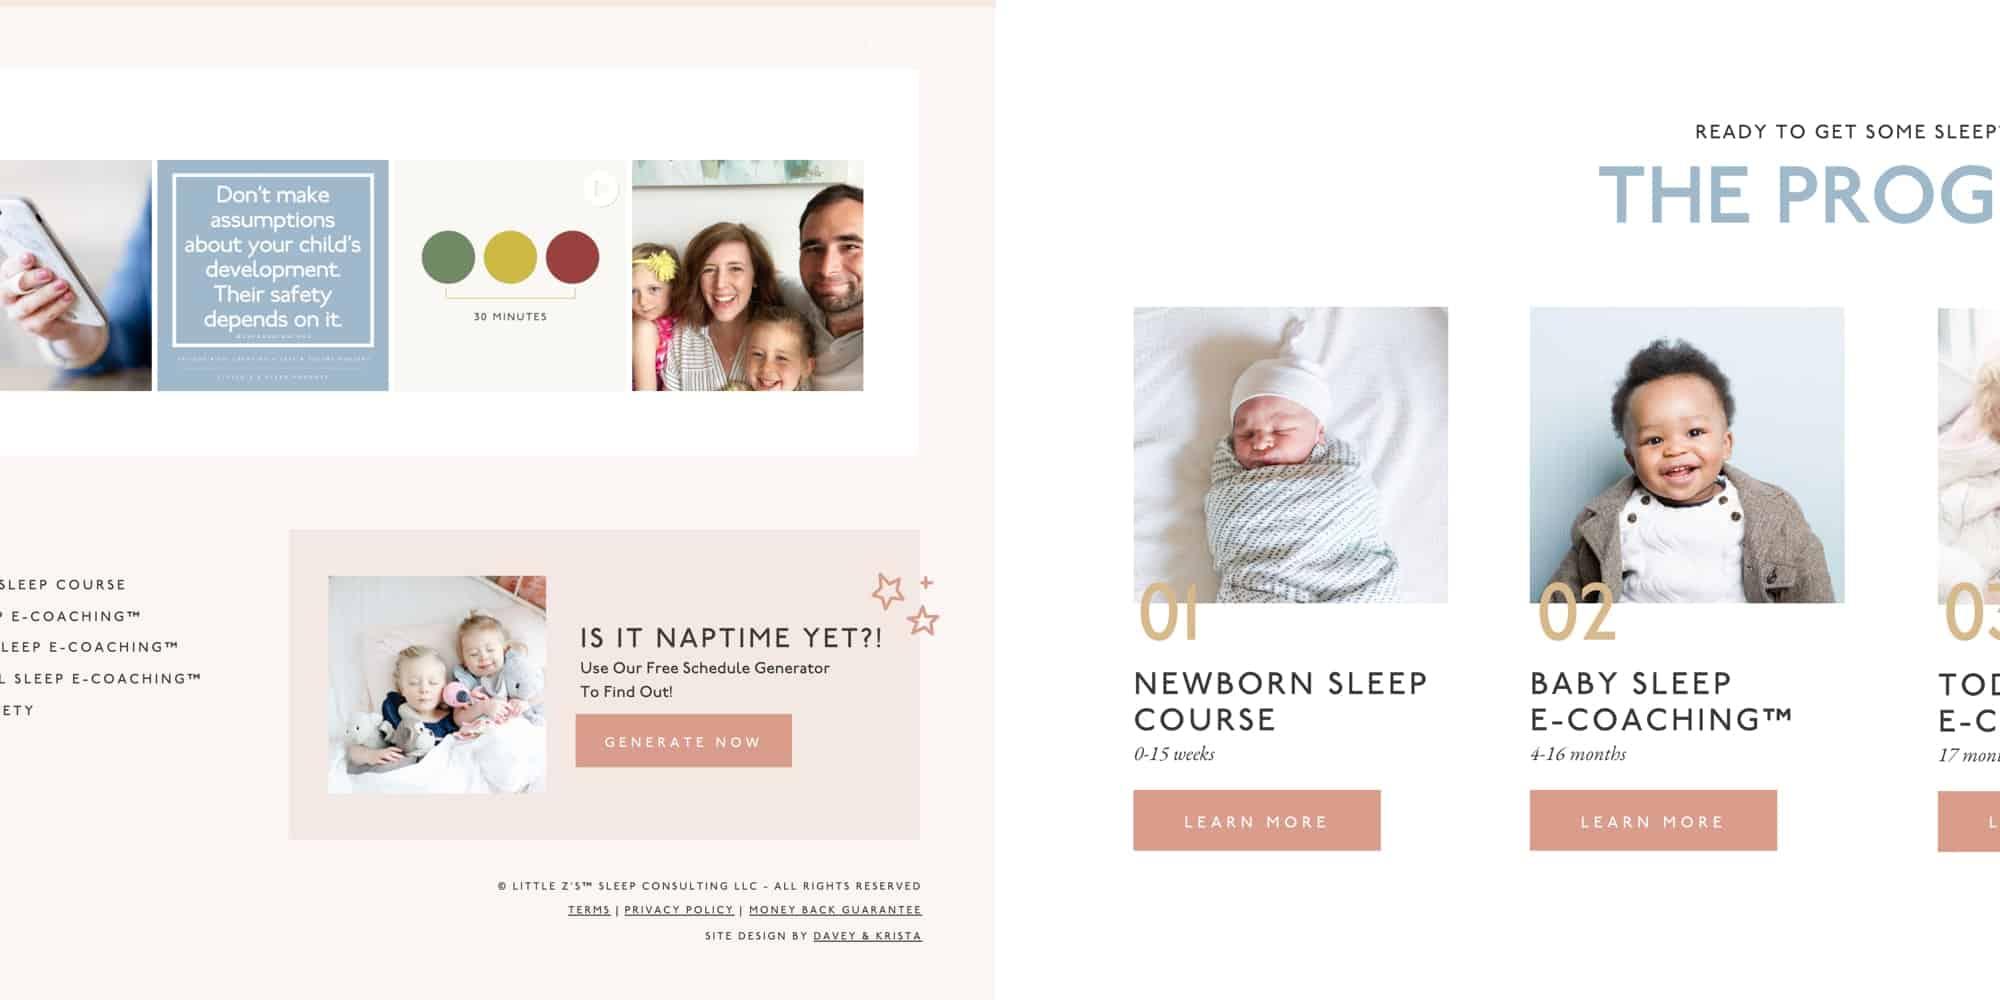 Online coach website design template for Showit | Davey & Krista